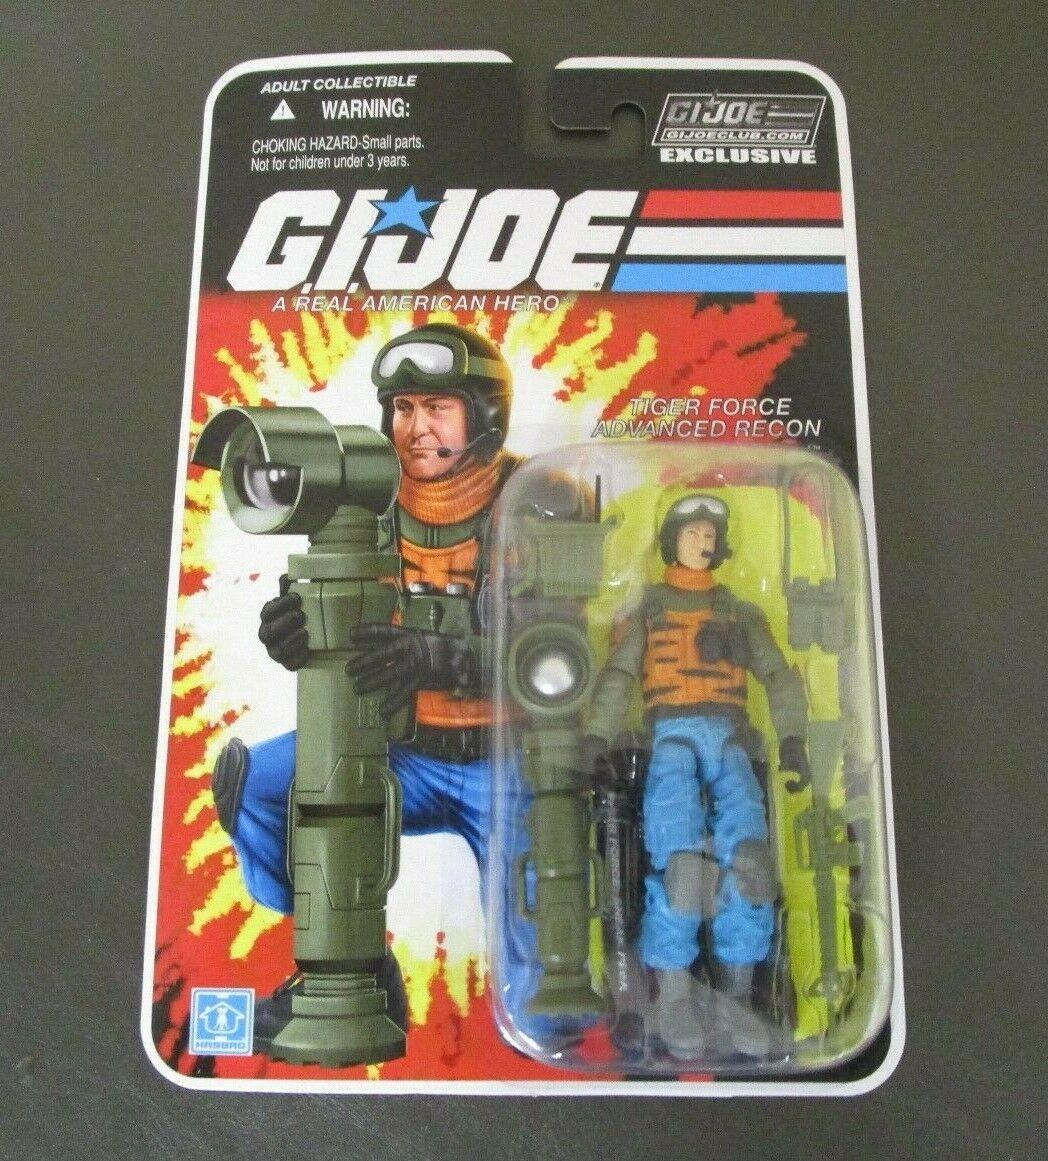 Sneak Peek Tiger Force FSS G.I. Joe Cobra 25th Collector's club exclusivo menta en tarjeta